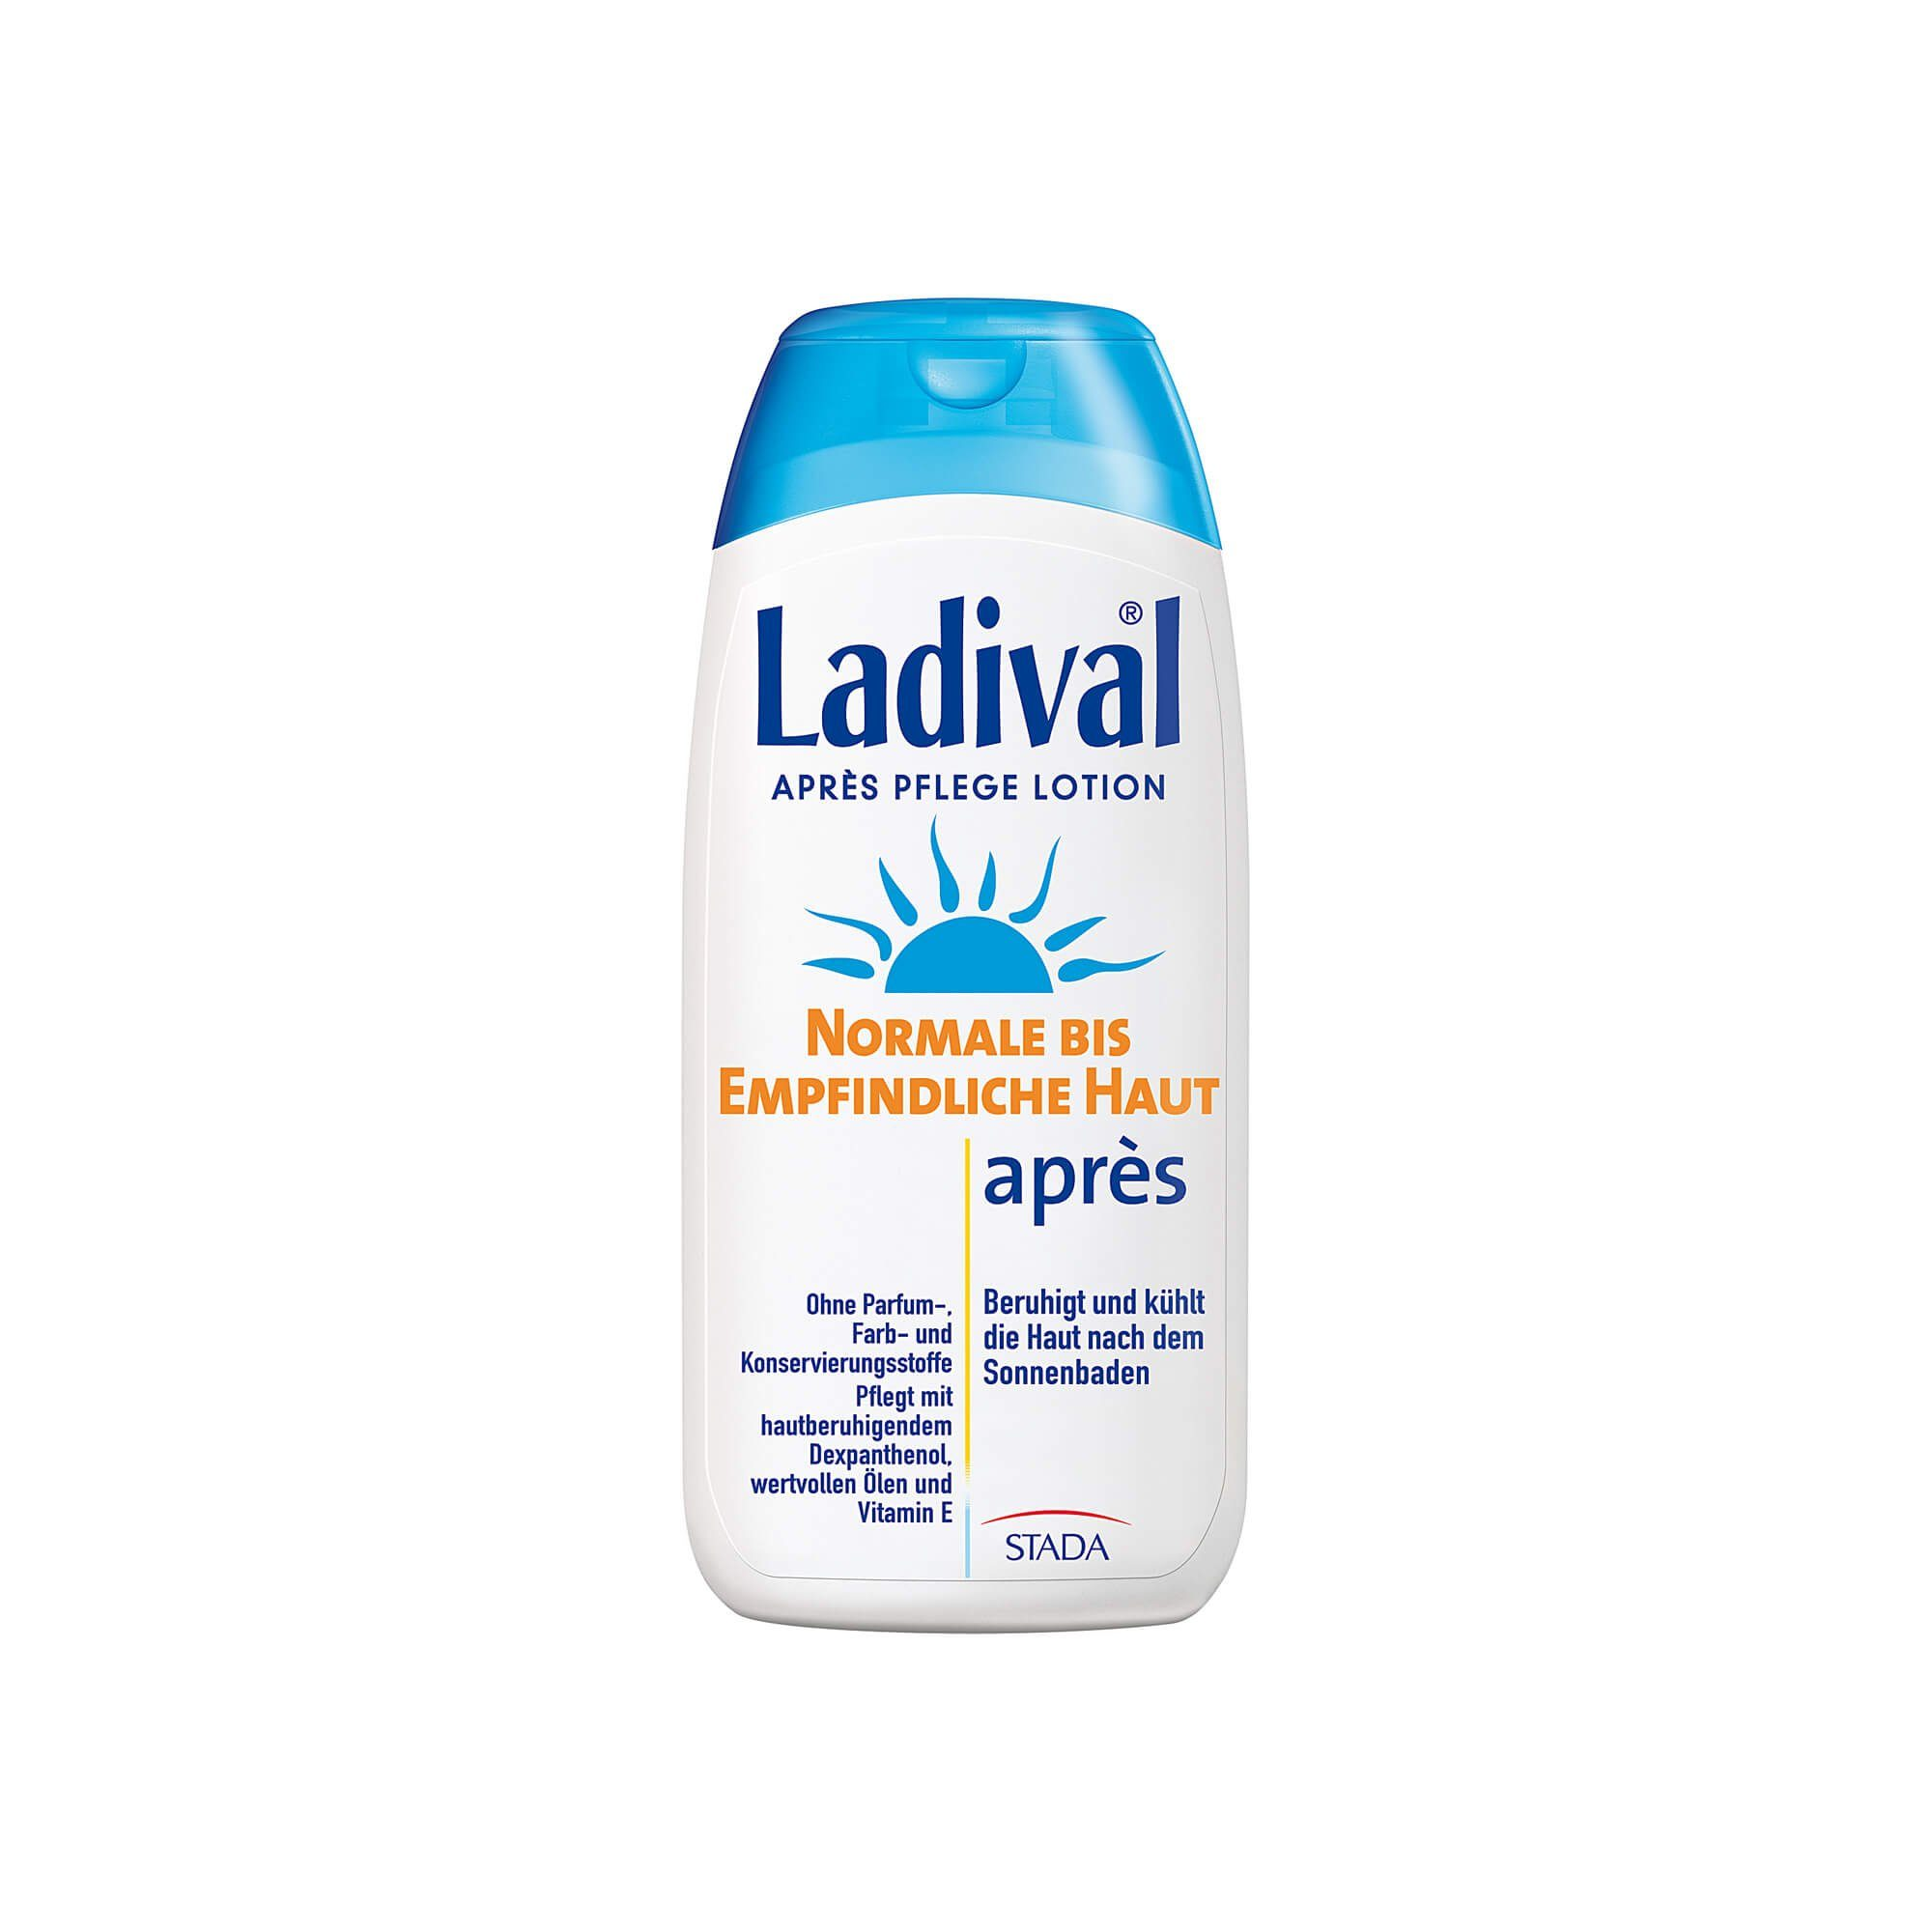 Ladival Normale bis Empfindliche Haut Apres Lotion , 200 ml